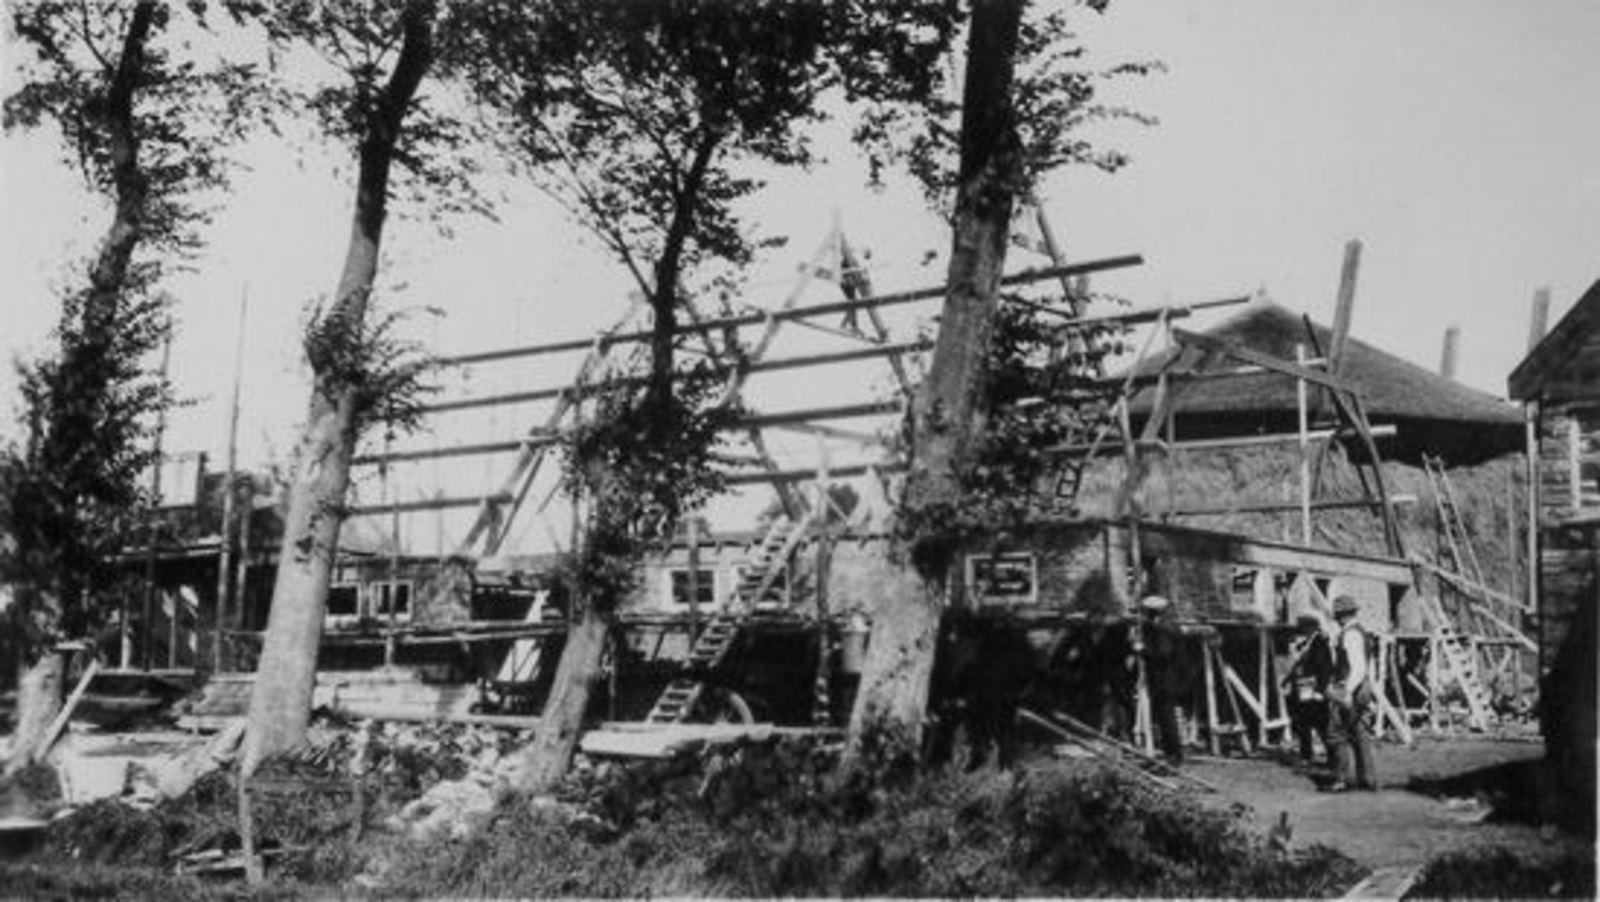 Cruquiusdijk 0095 1925± Paulina Agneta Hoeve 03